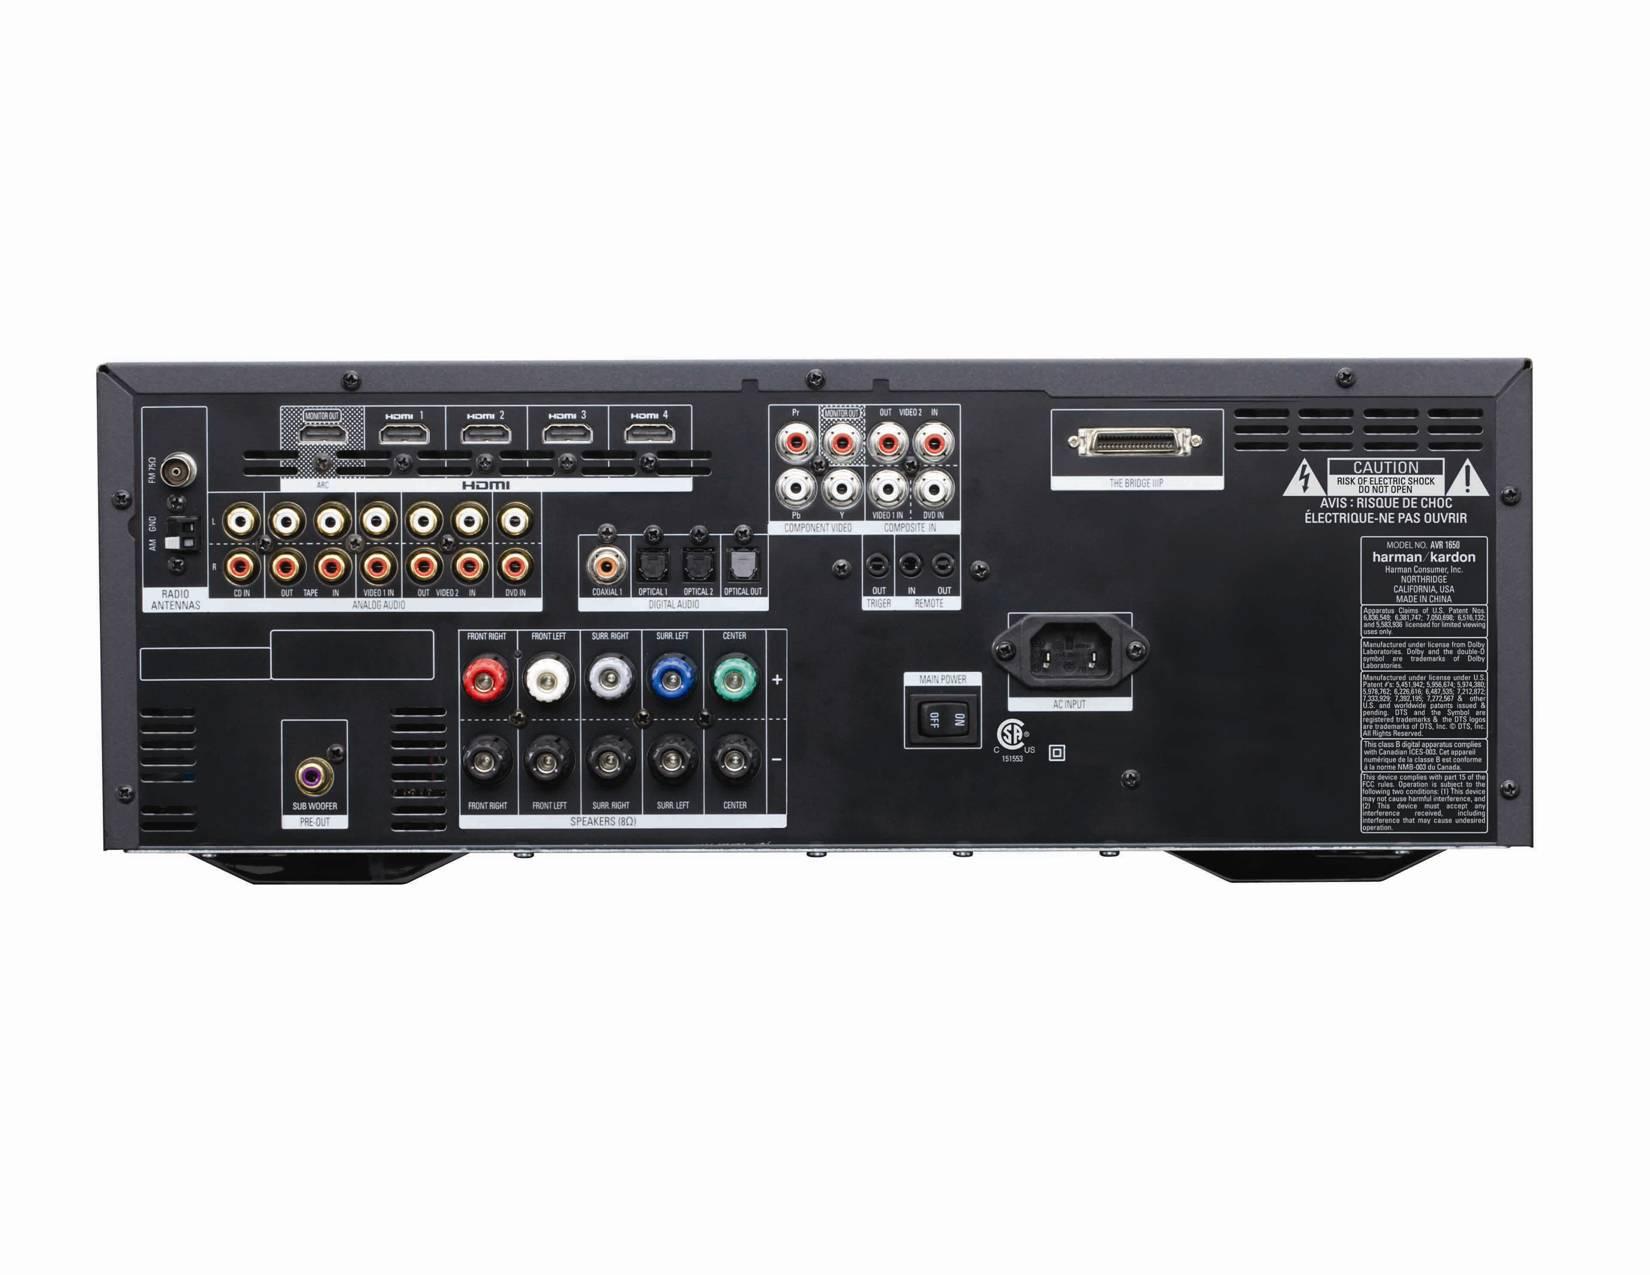 amazon com harman kardon avr 1650 5 1 channel 95 watt audio video rh amazon com